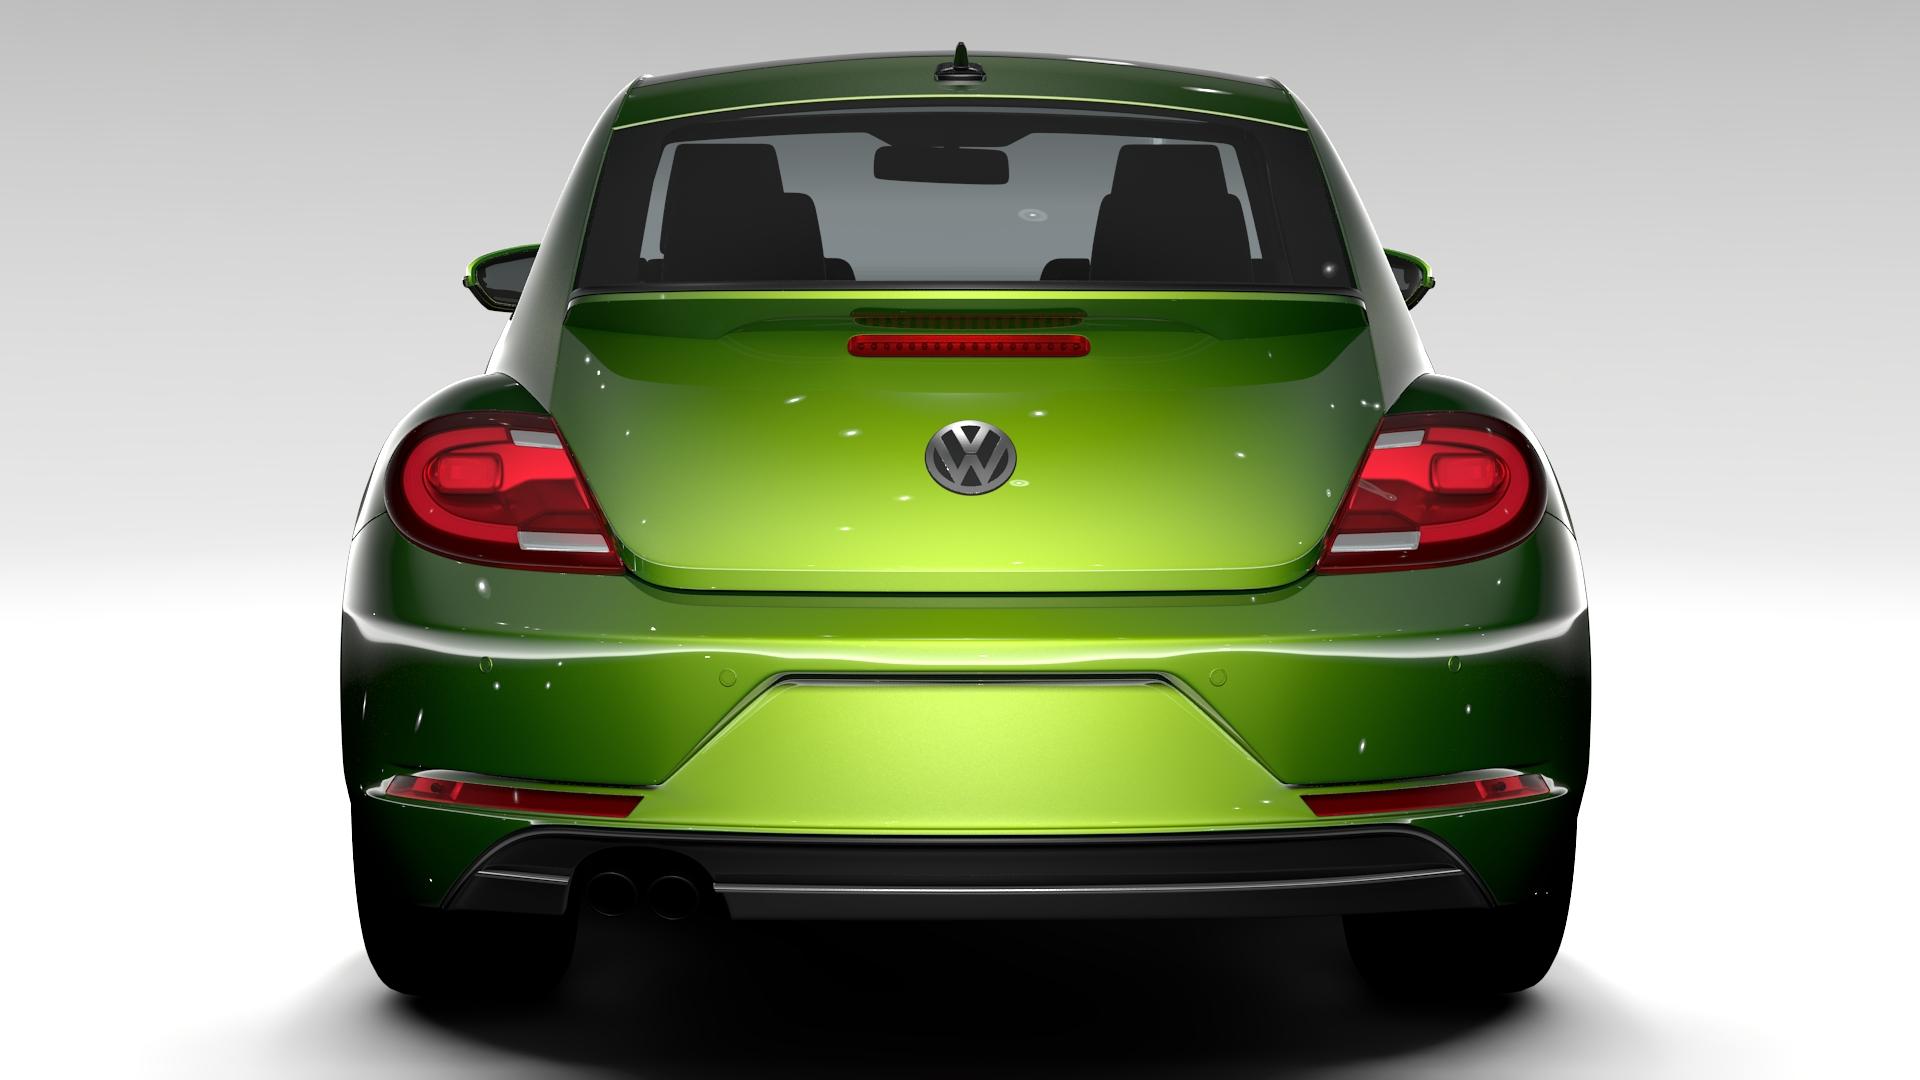 vw beetle 2017 3d model 3ds max fbx c4d lwo ma mb hrc xsi obj 221569